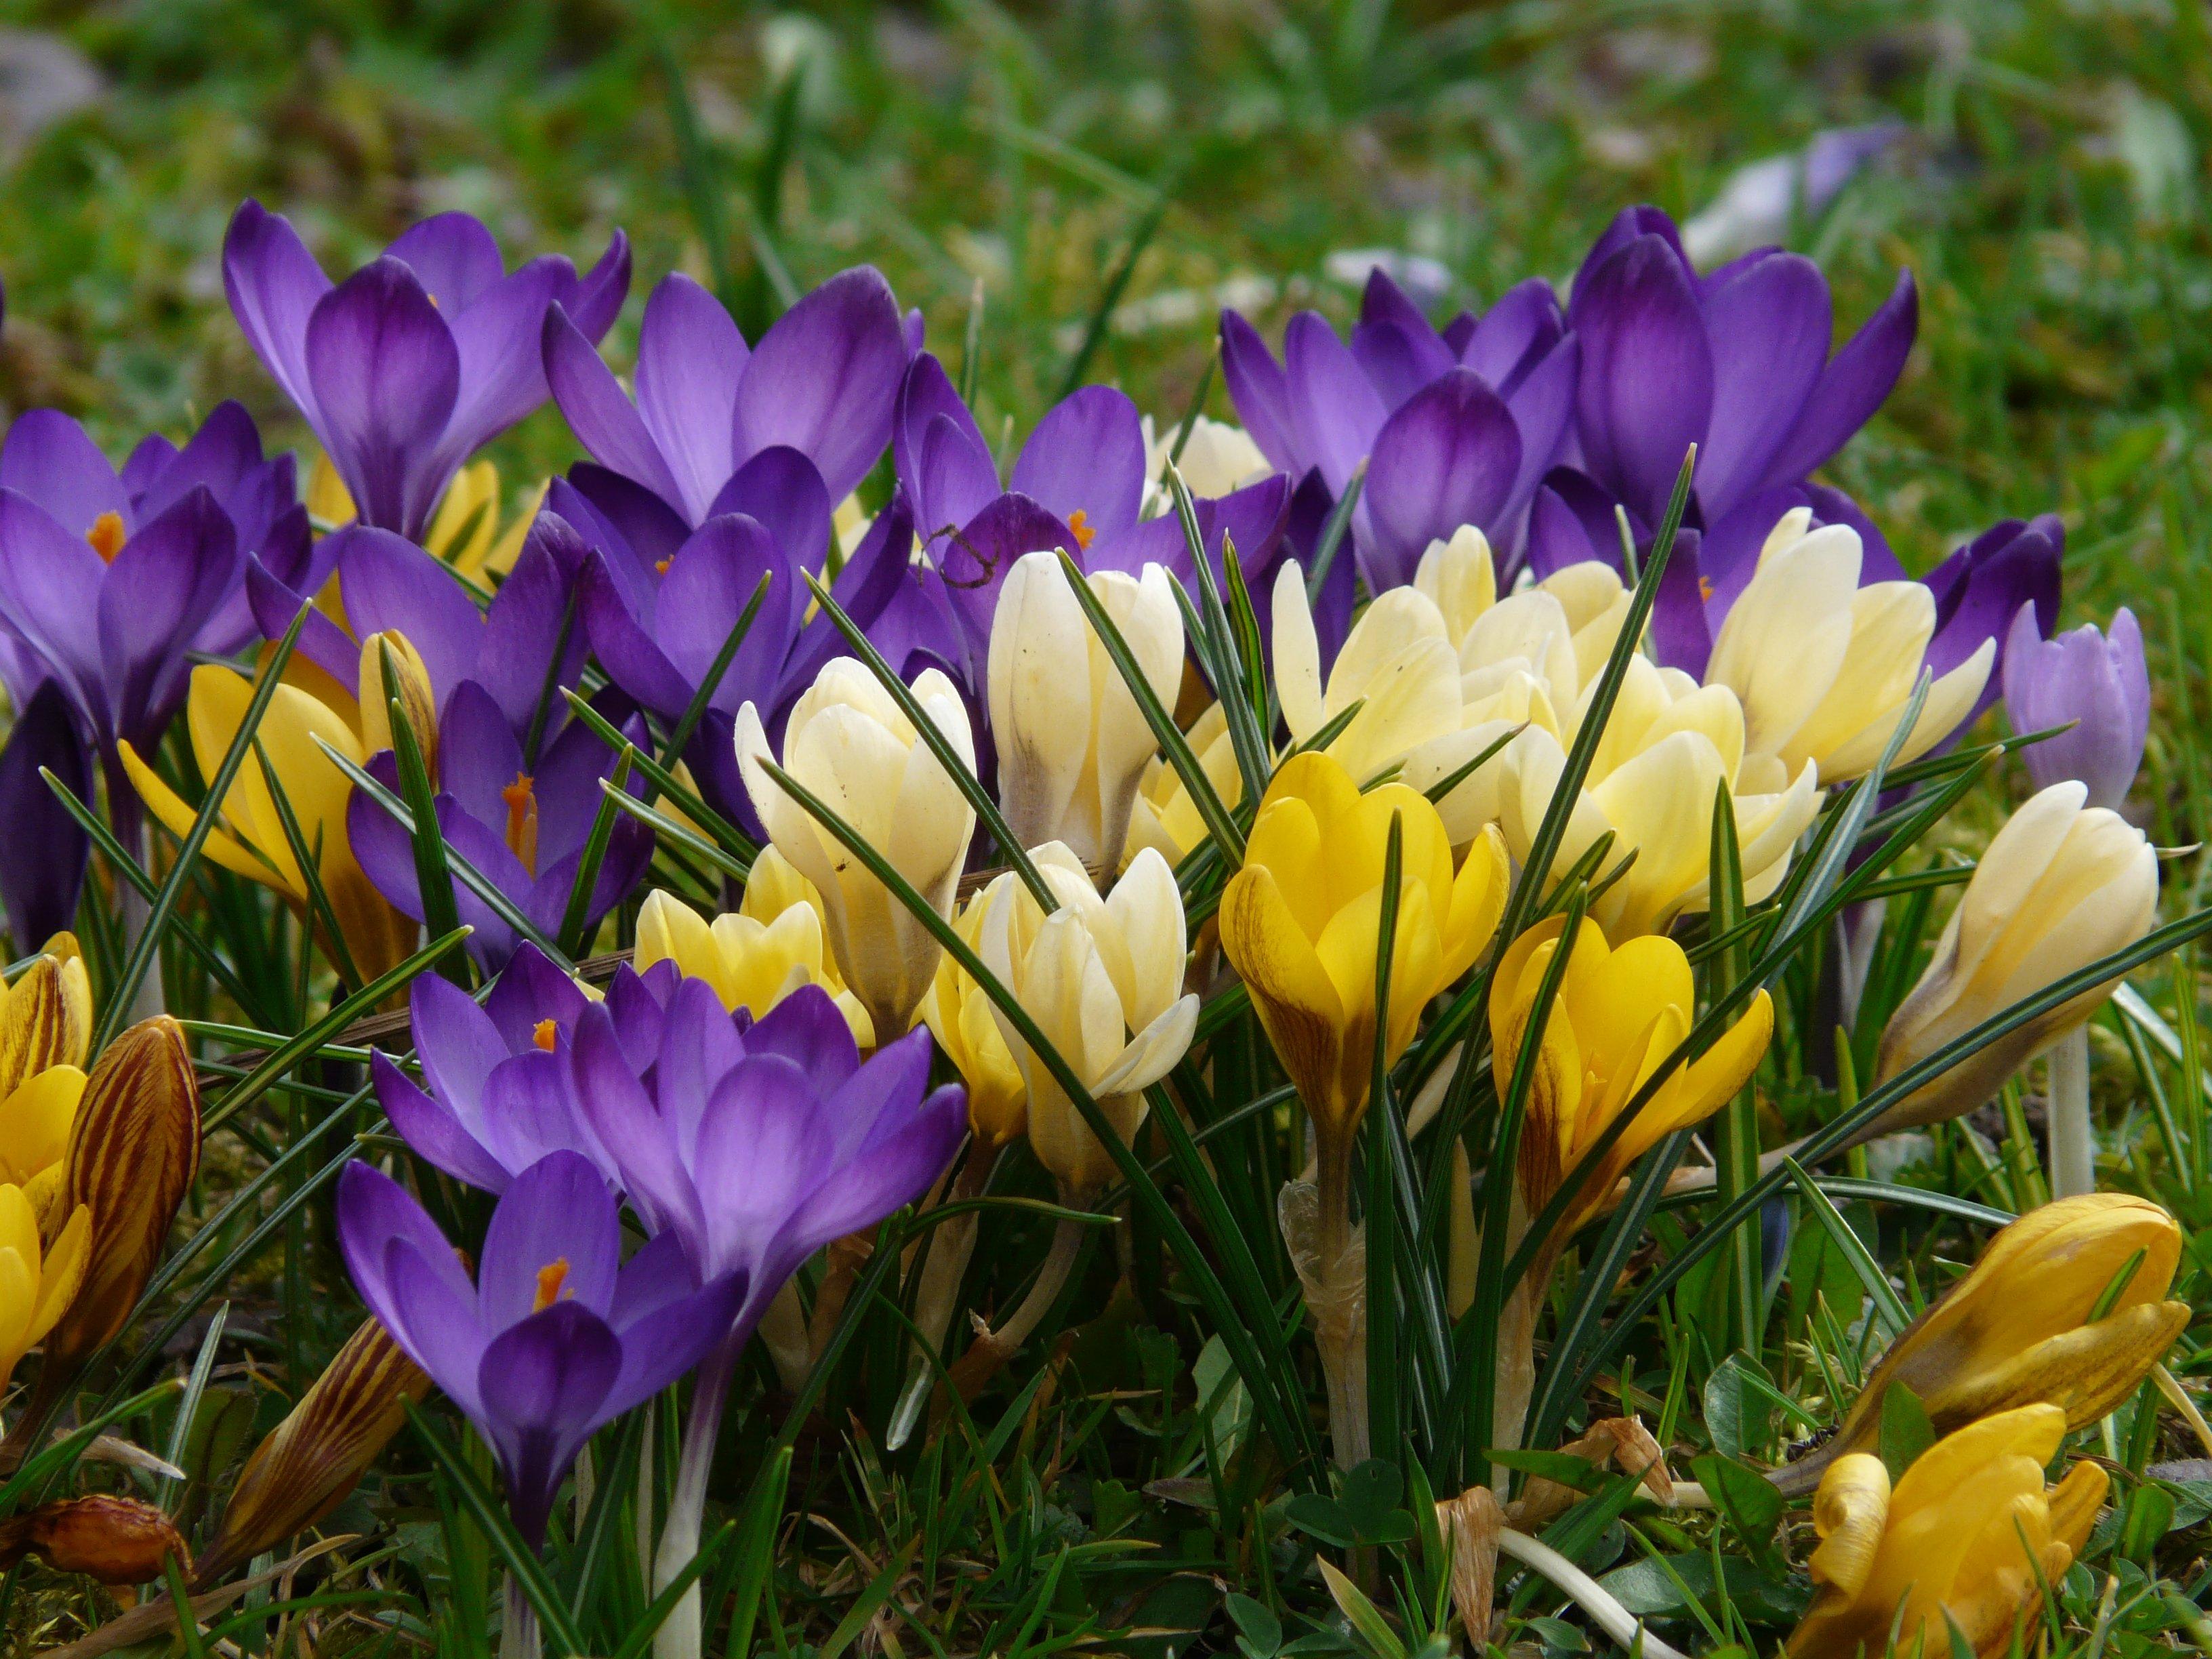 Фото и описание весенних цветов